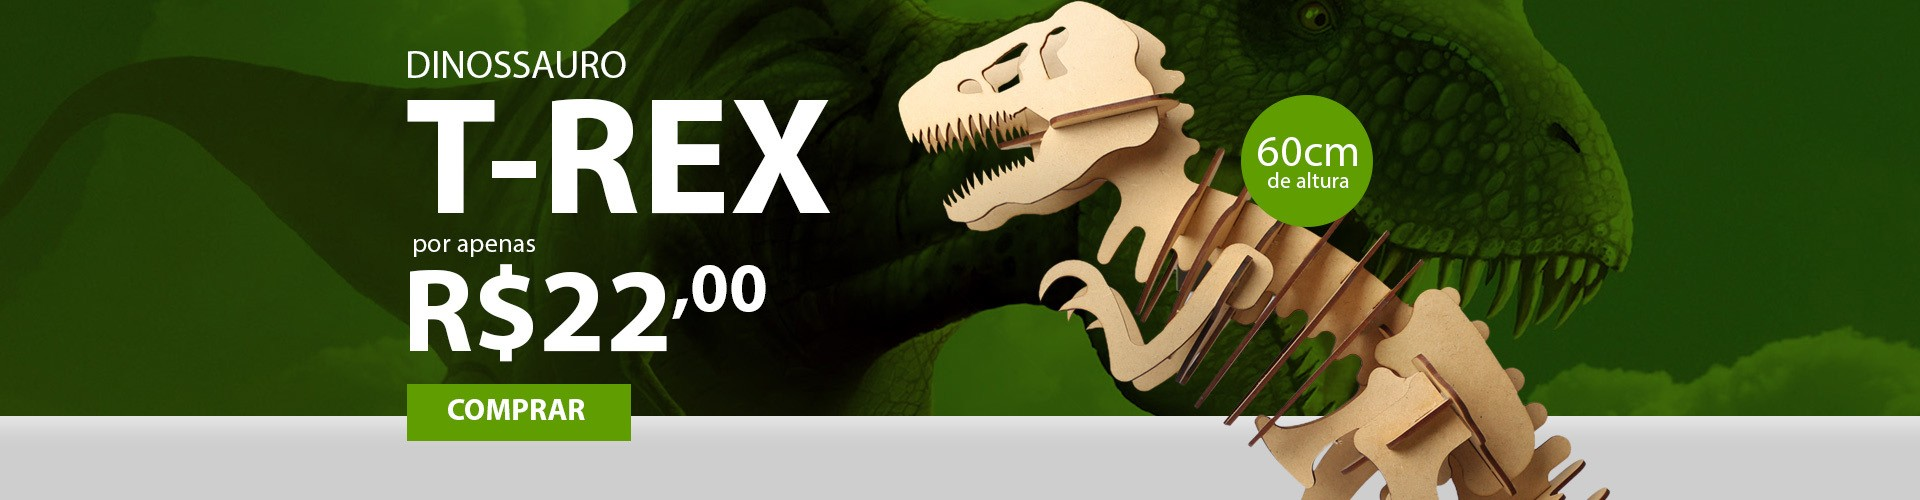 Dinossauro T-Rex Tiranossauro Rex MDF 3mm Cru Brinquedos Yper Criativo